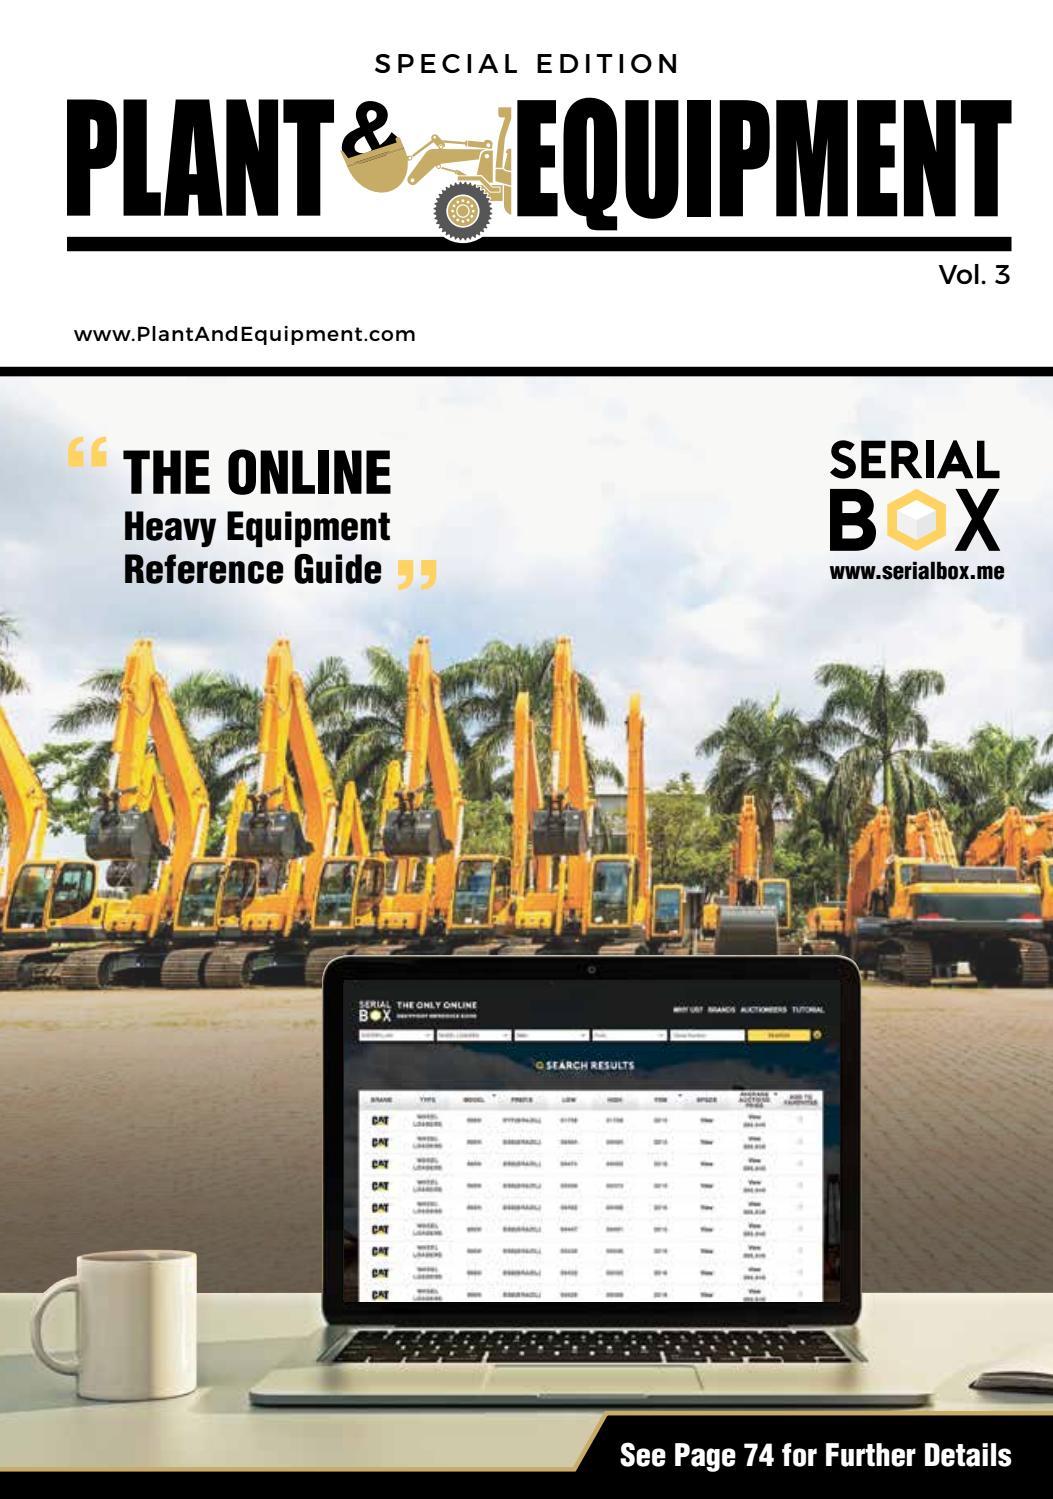 Plant & Equipment | Special Edition Vol 3 | bauma India by